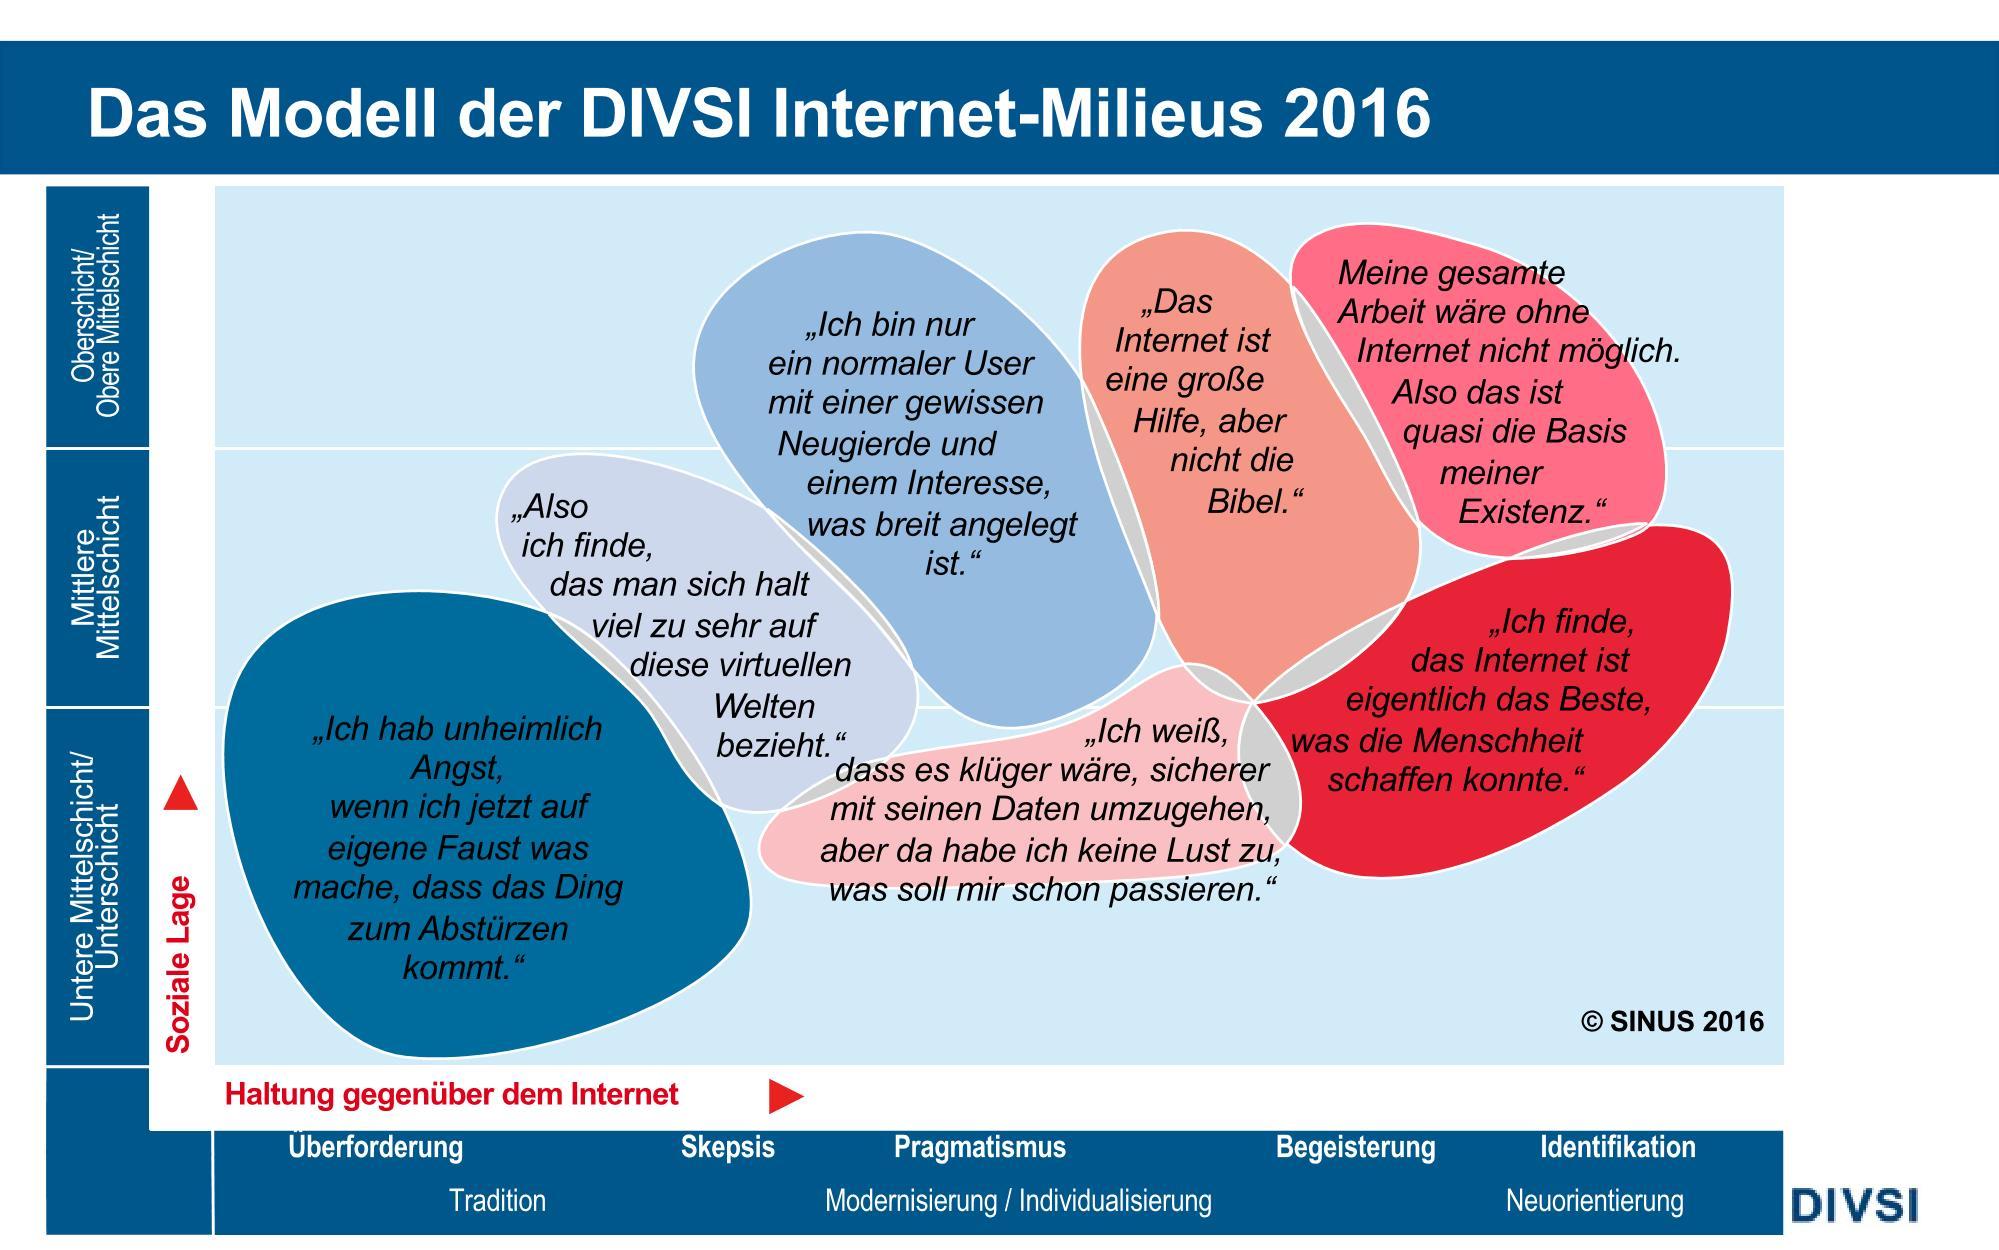 2016-06-28_PK_DIVSI-Milieus-2016_Page_16